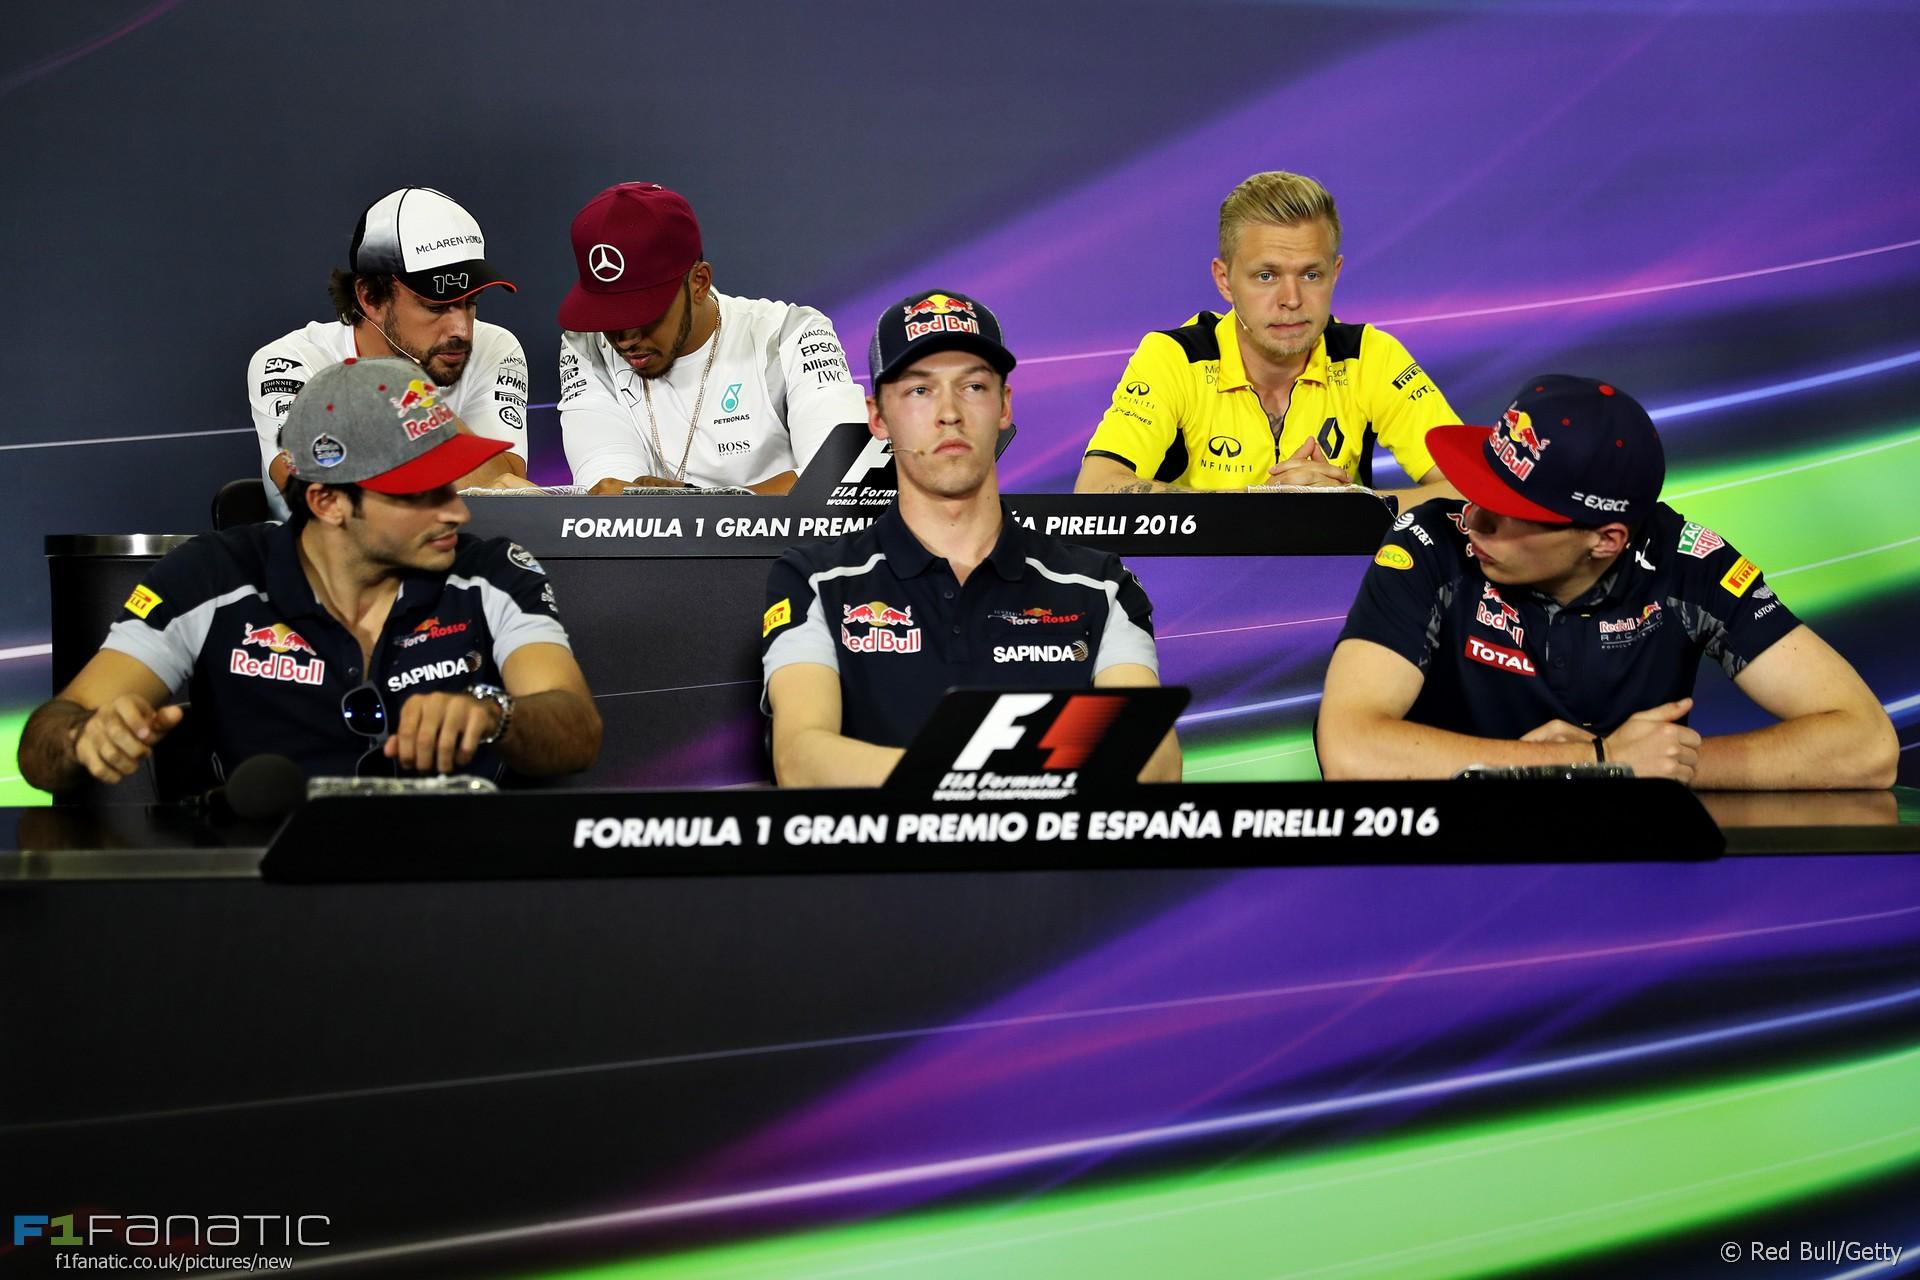 Fernando Alonso, Lewis Hamilton, Kevin Magnussen, Carlos Sainz Jnr, Daniil Kvyat, Max Verstappen, Circuit de Catalunya, 2016